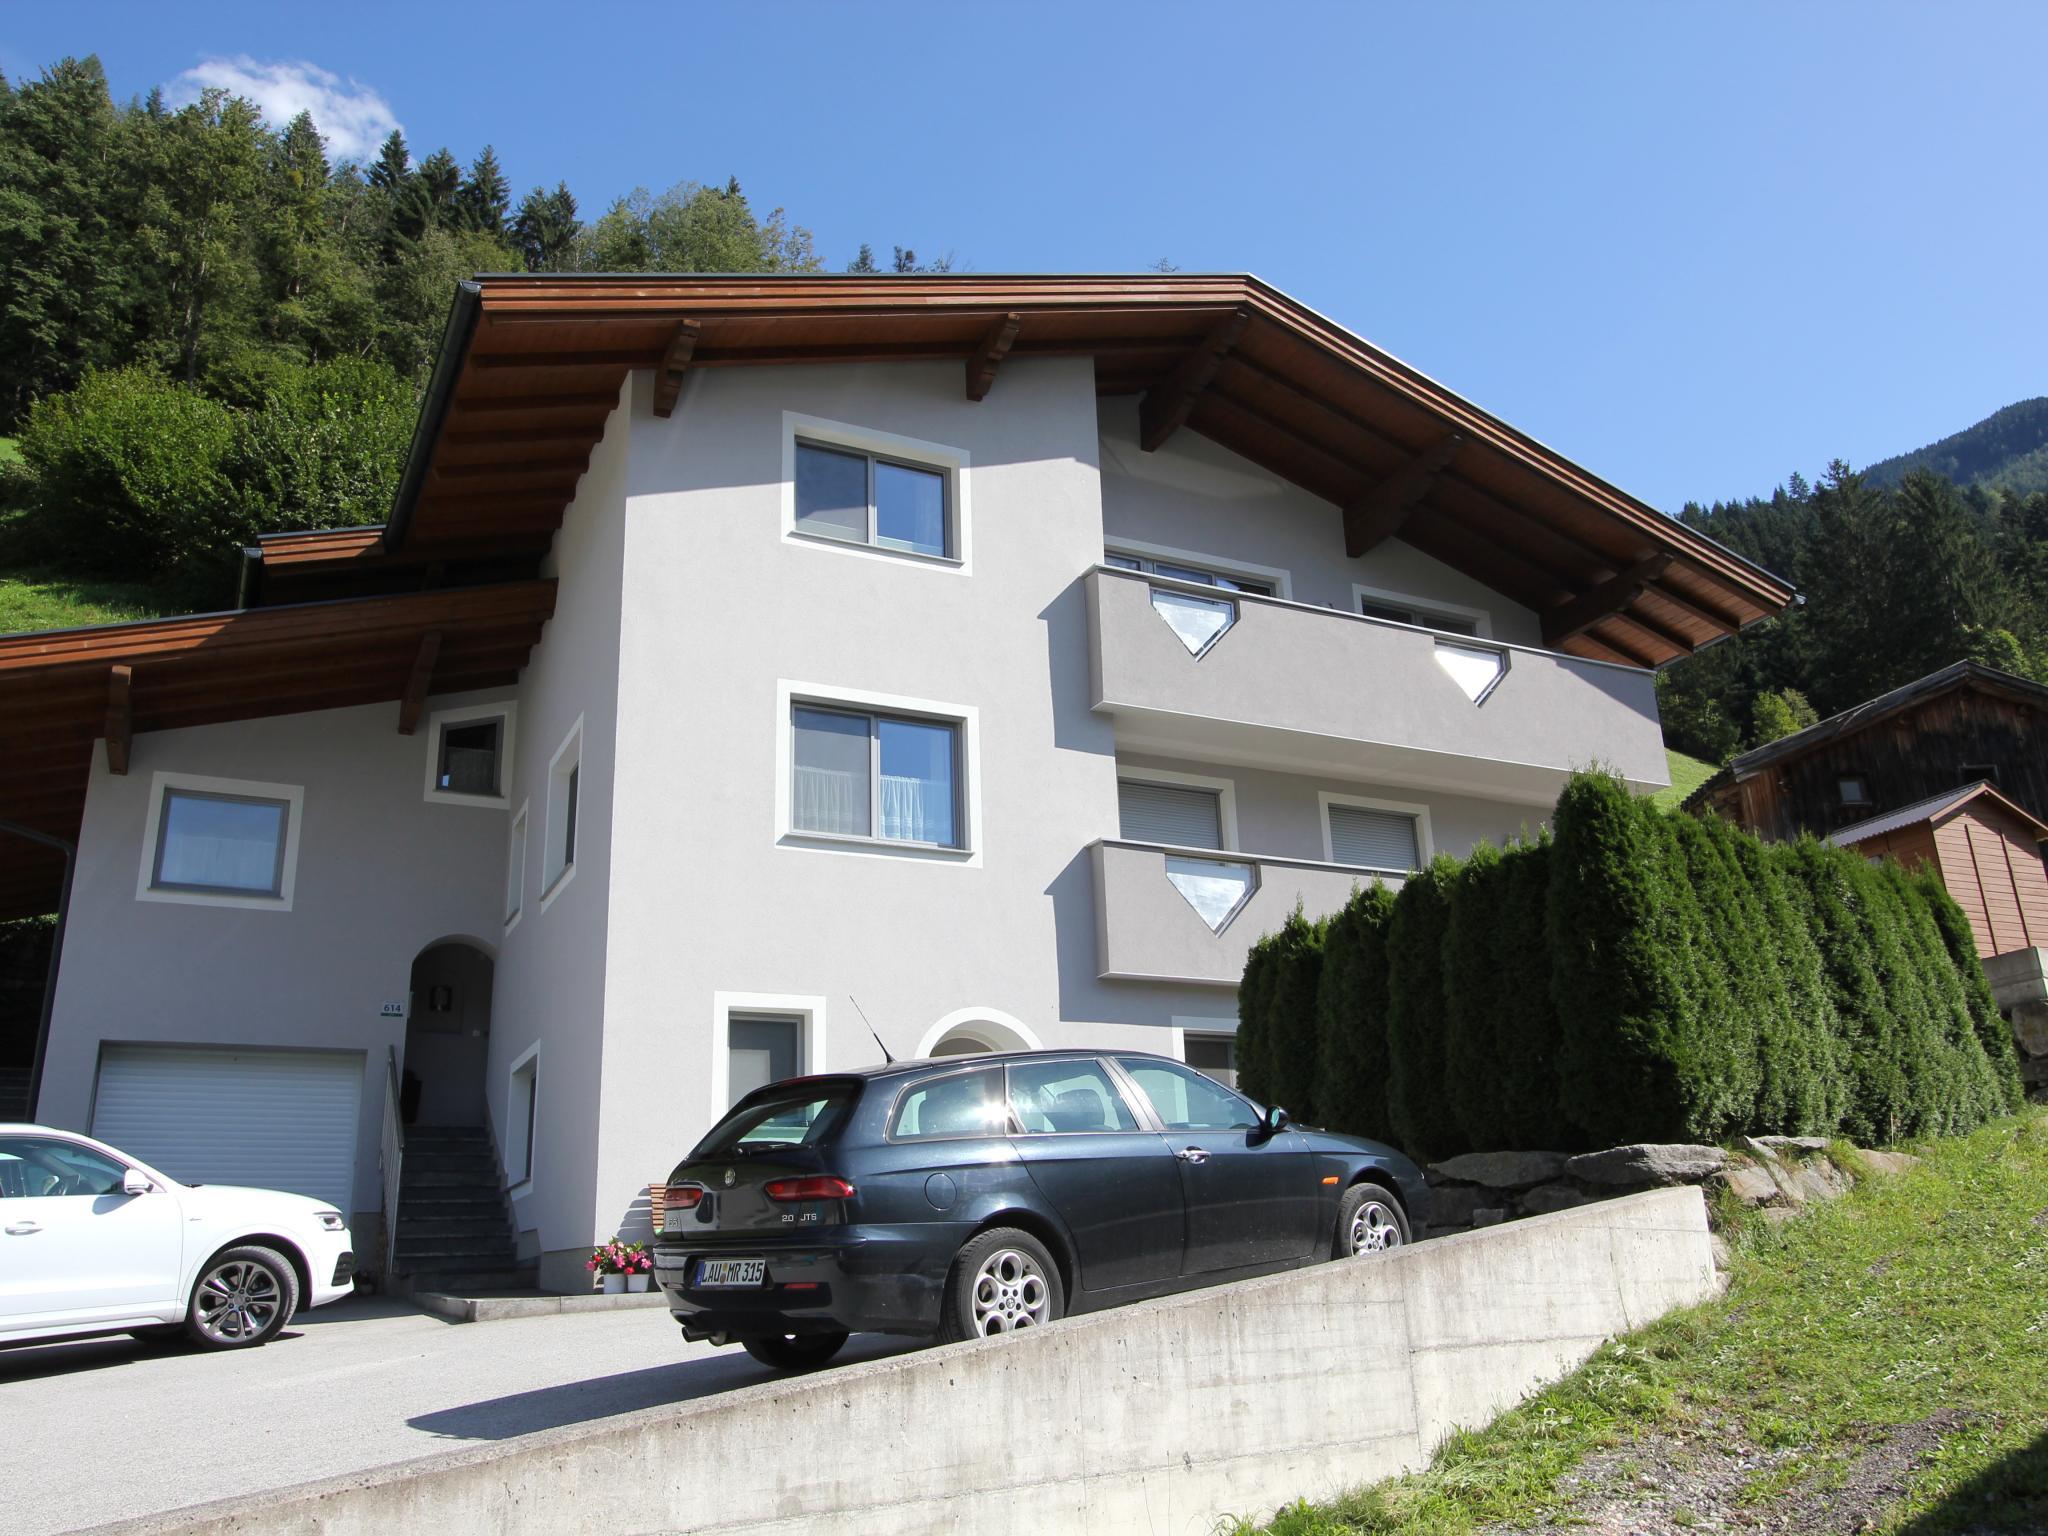 Apart Horbergblick Tirol